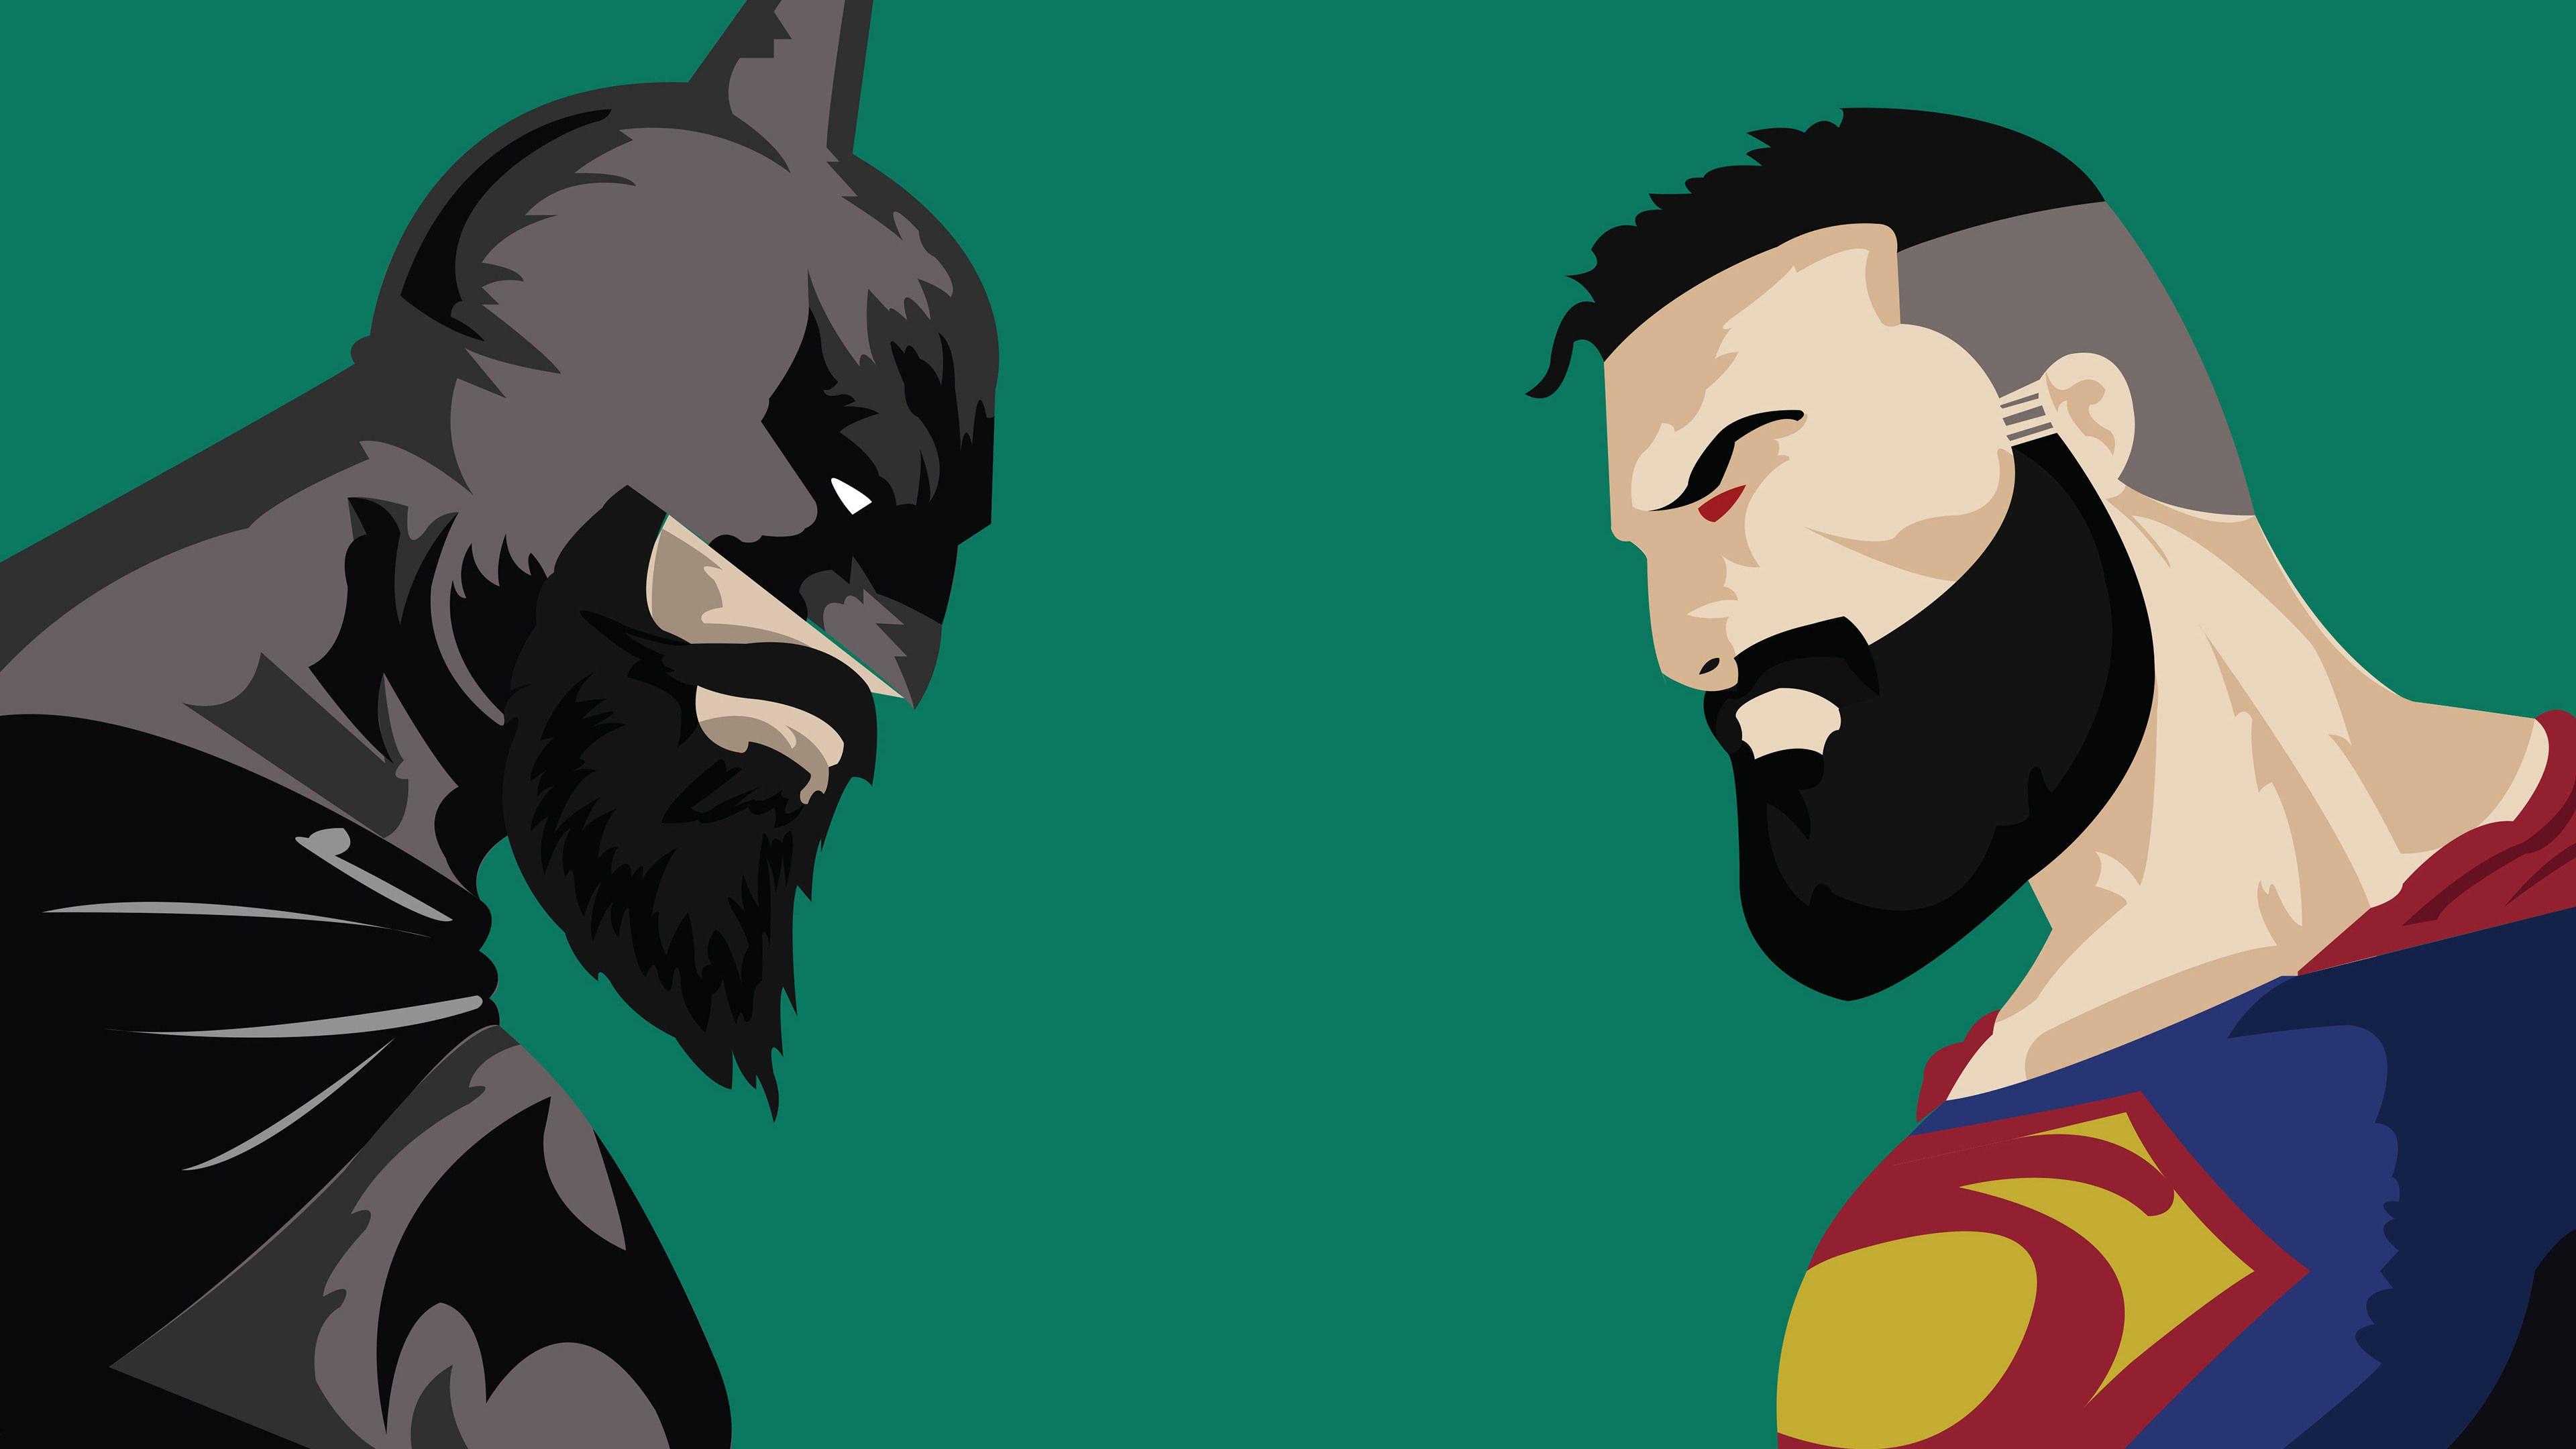 Batman Vs Superman With Beard Superman Wallpapers Super